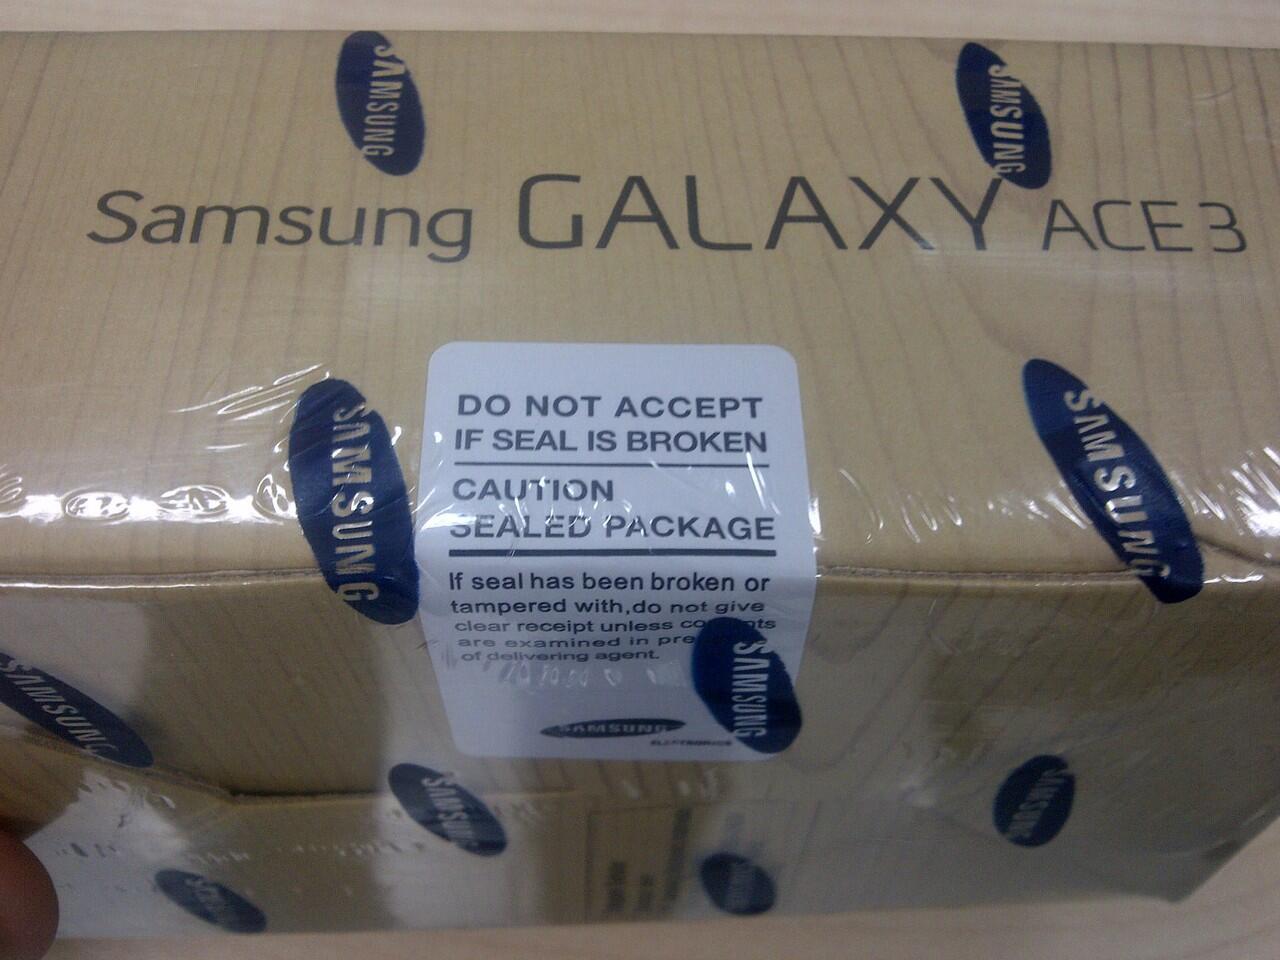 WTS SAMSUNG GALAXY ACE 3 NEW METALIC BLACK (BNIB)